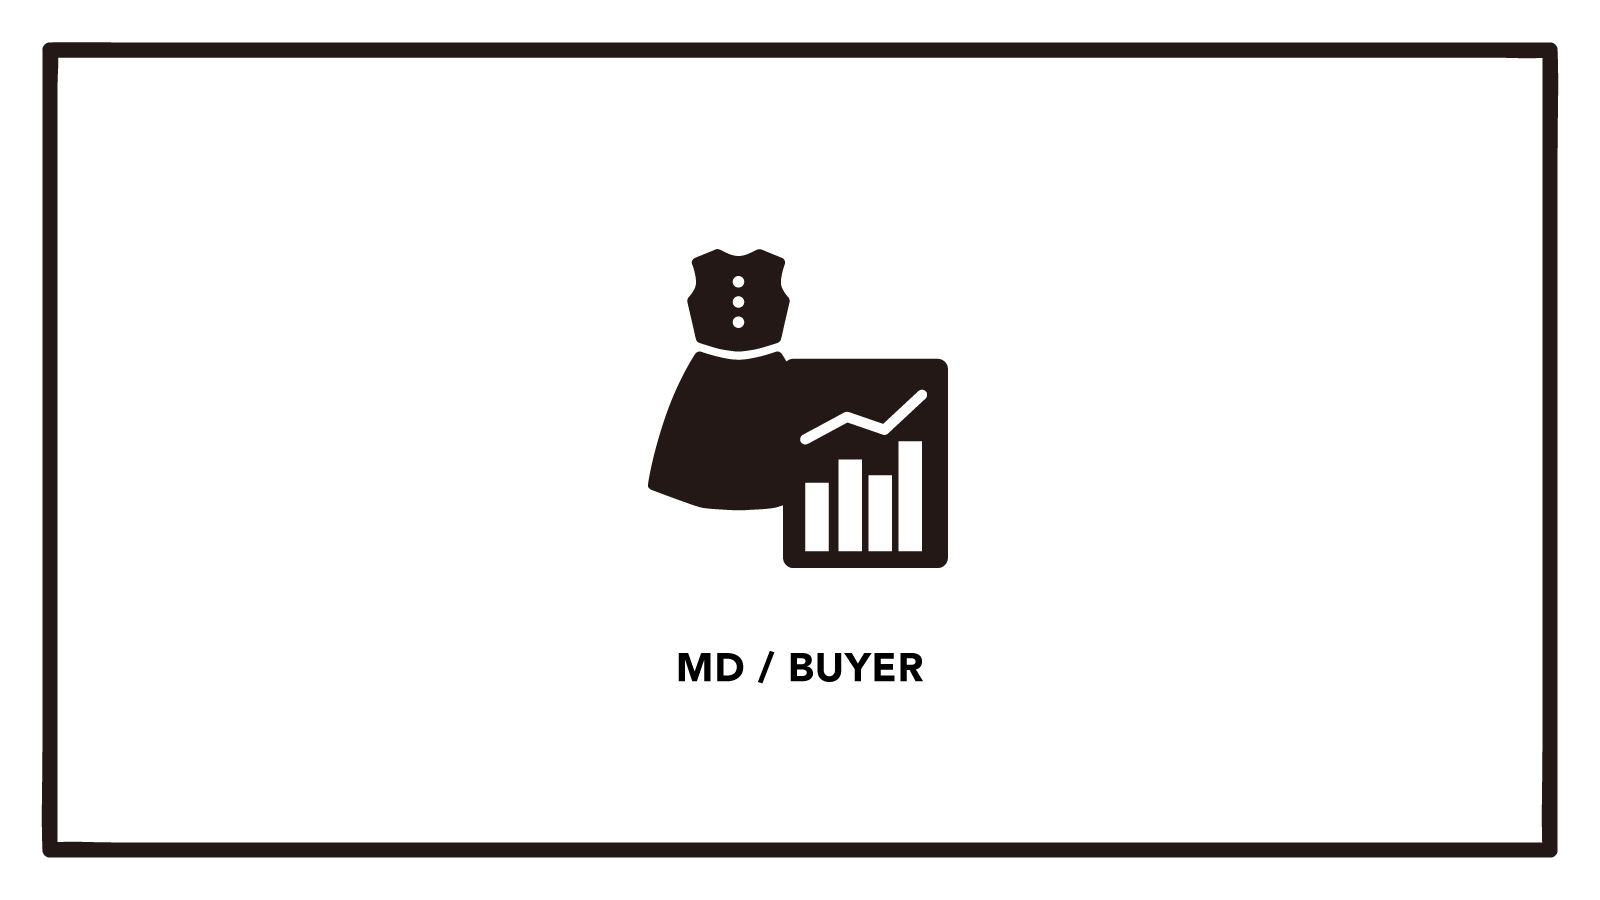 【MD】大手企業での募集 経験者募集 雑貨、アンダーウェアのカバー写真